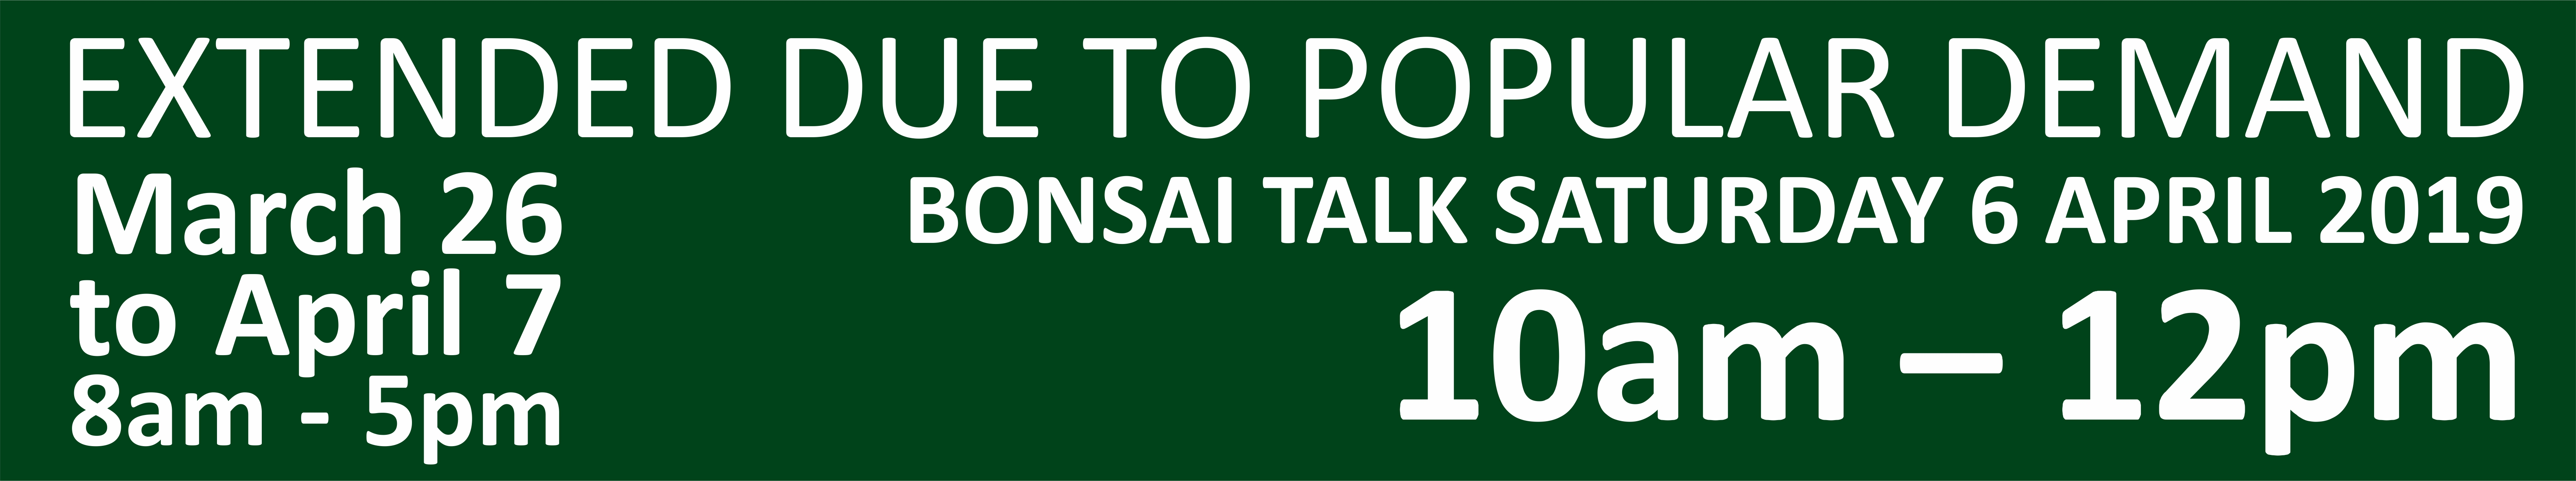 BONSAI BDS 2019 EXTENDED